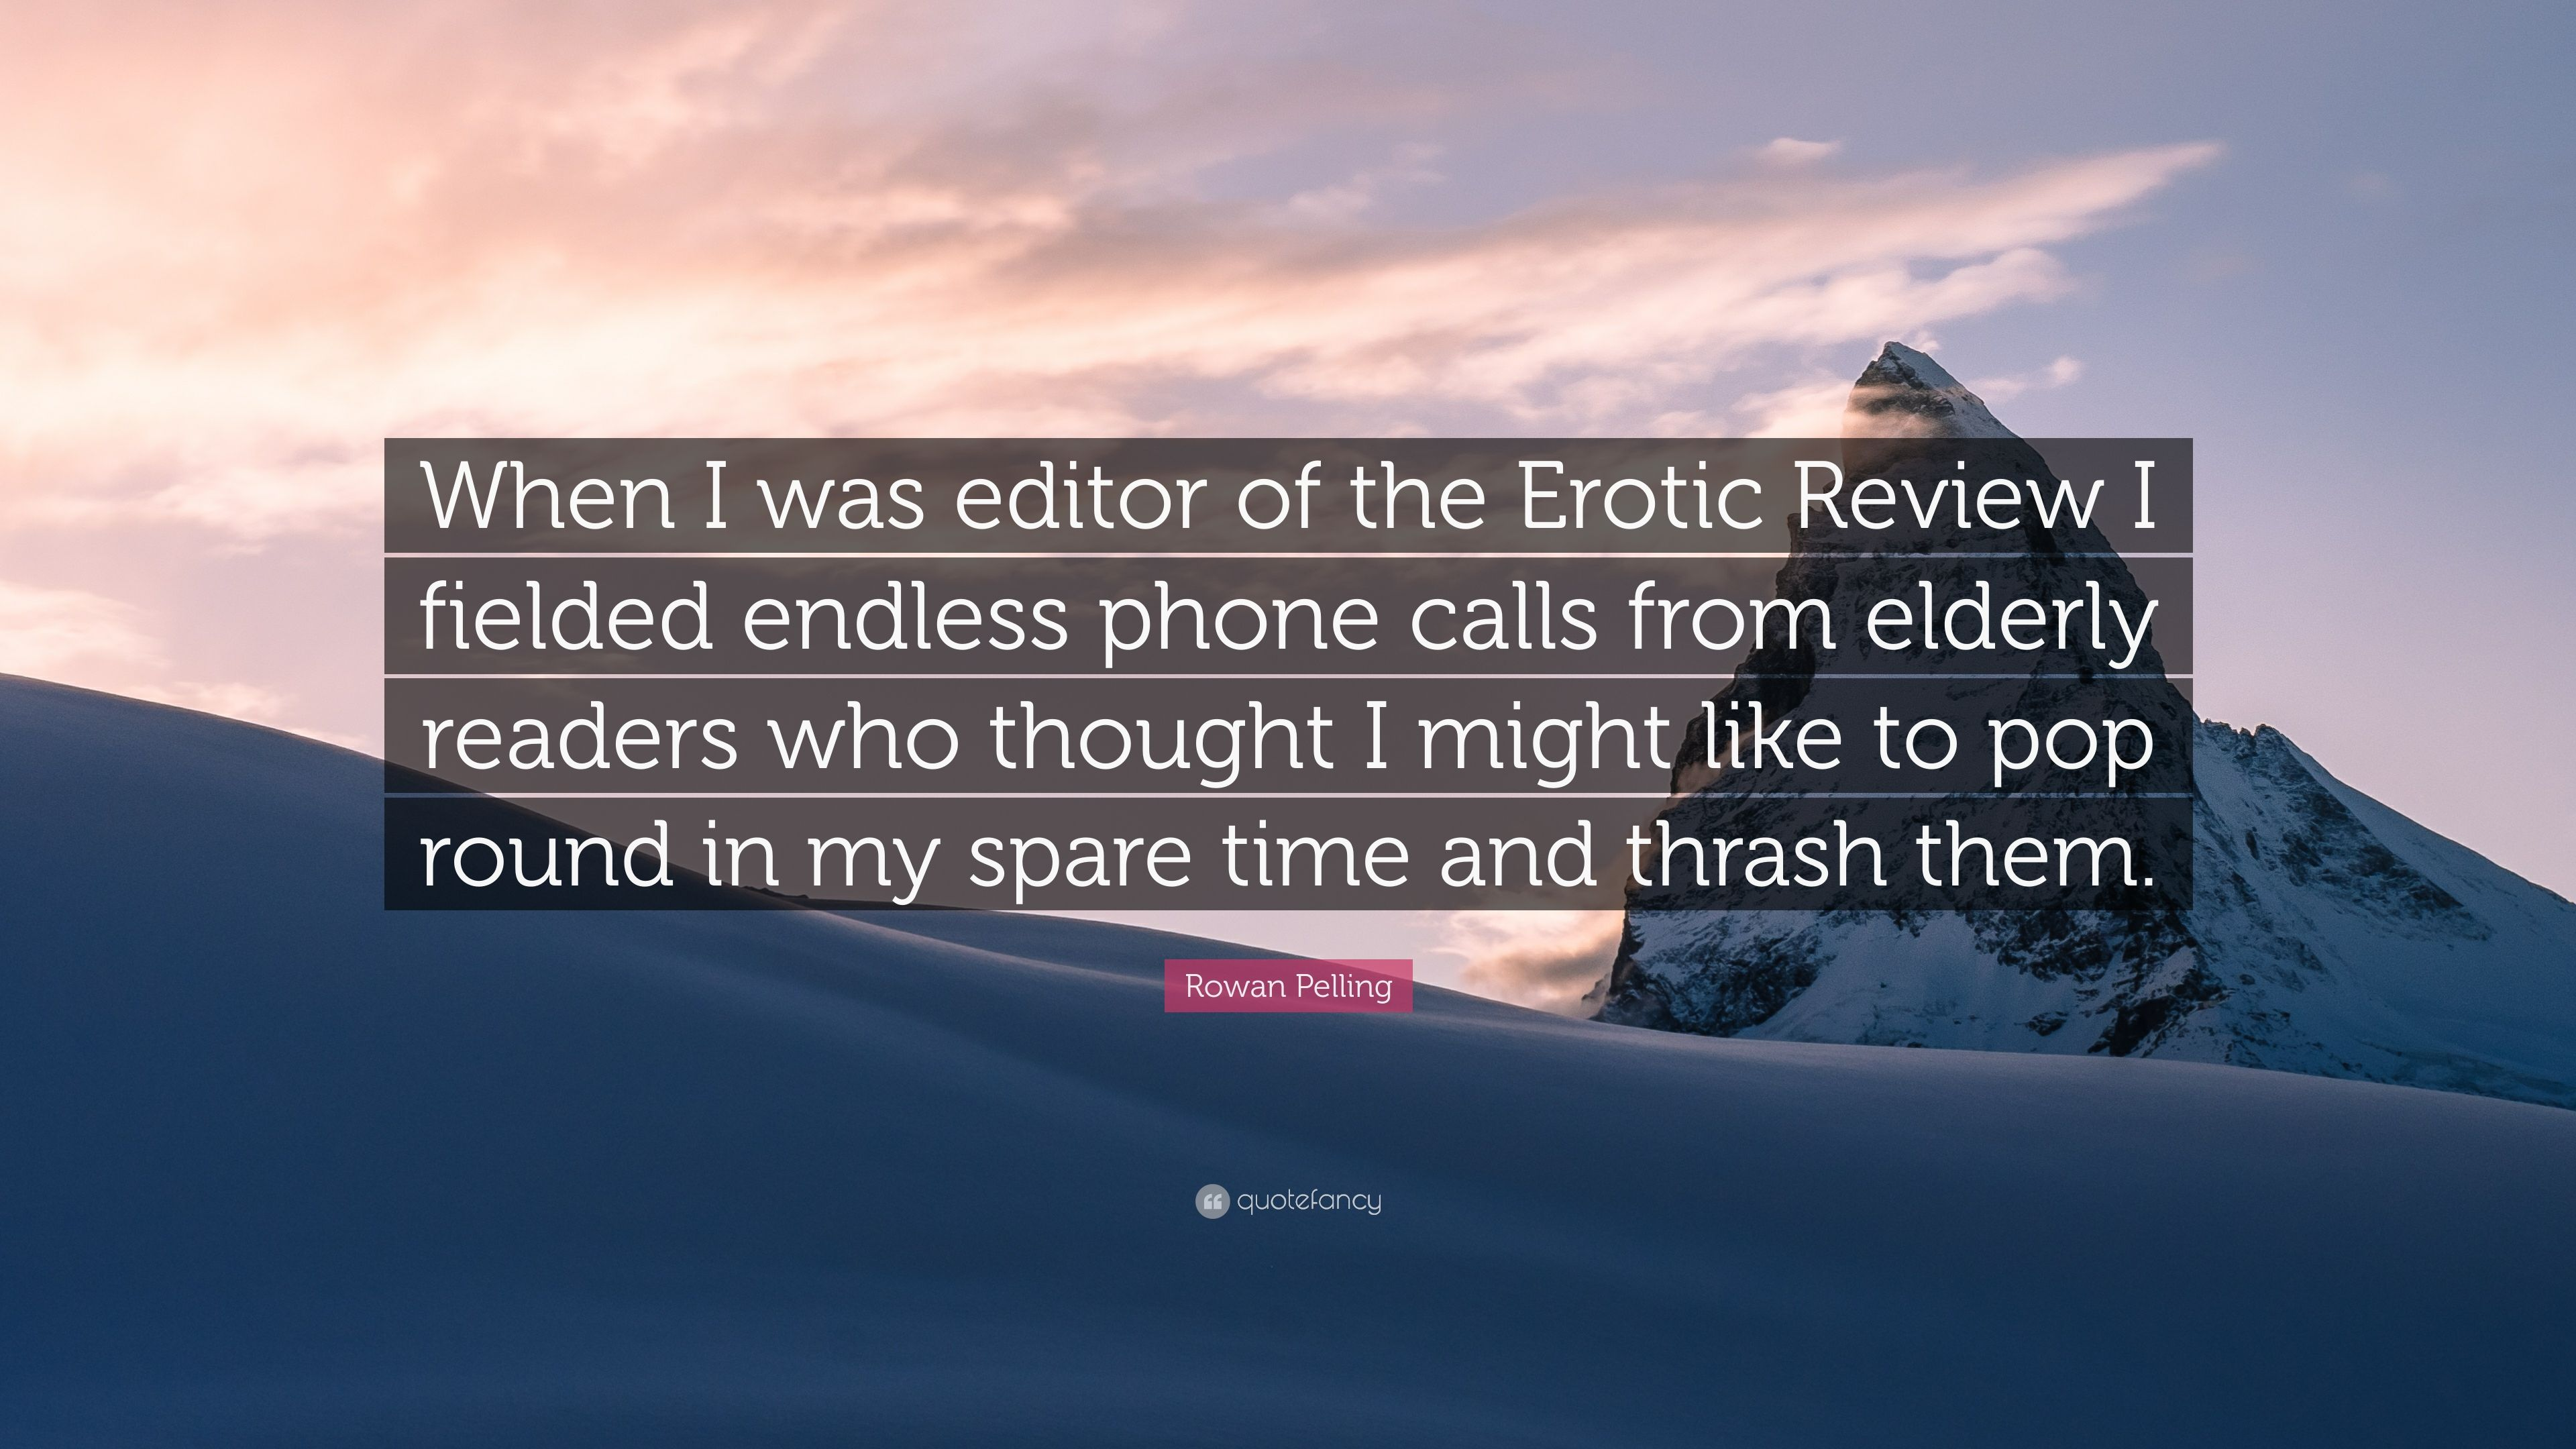 The erotic review rowan pelling